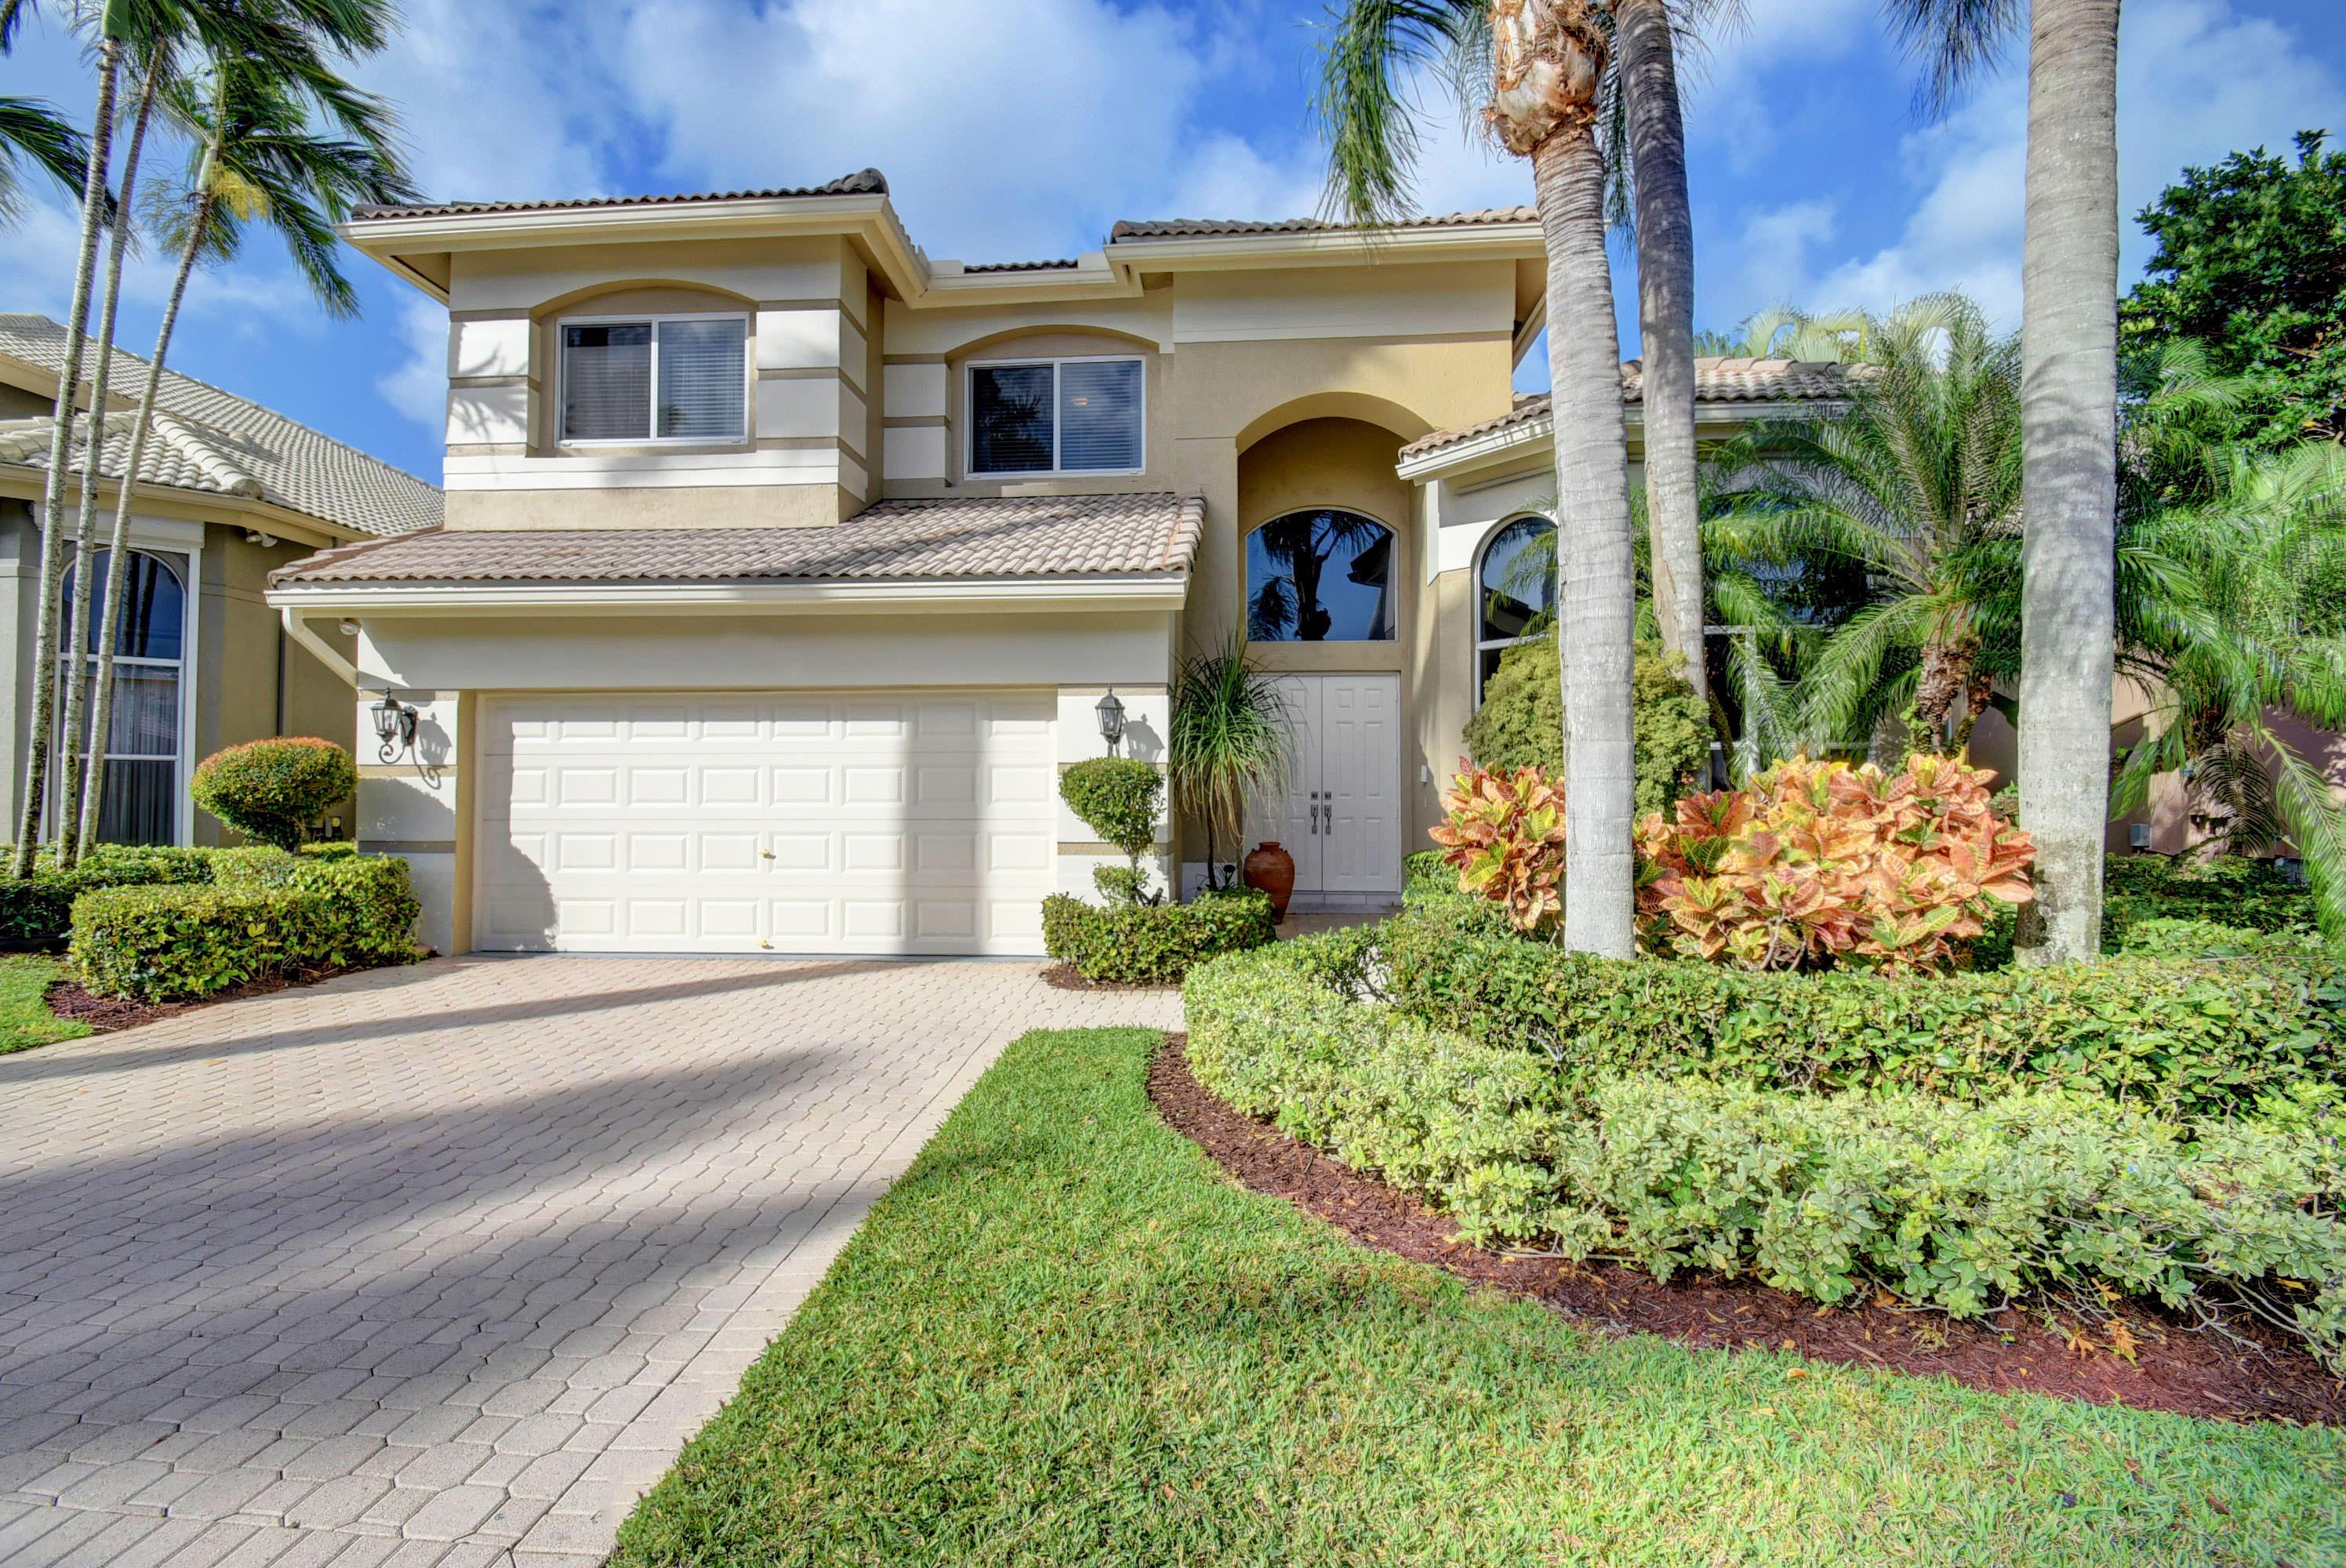 4141 NW 53RD Street Boca Raton, FL 33496